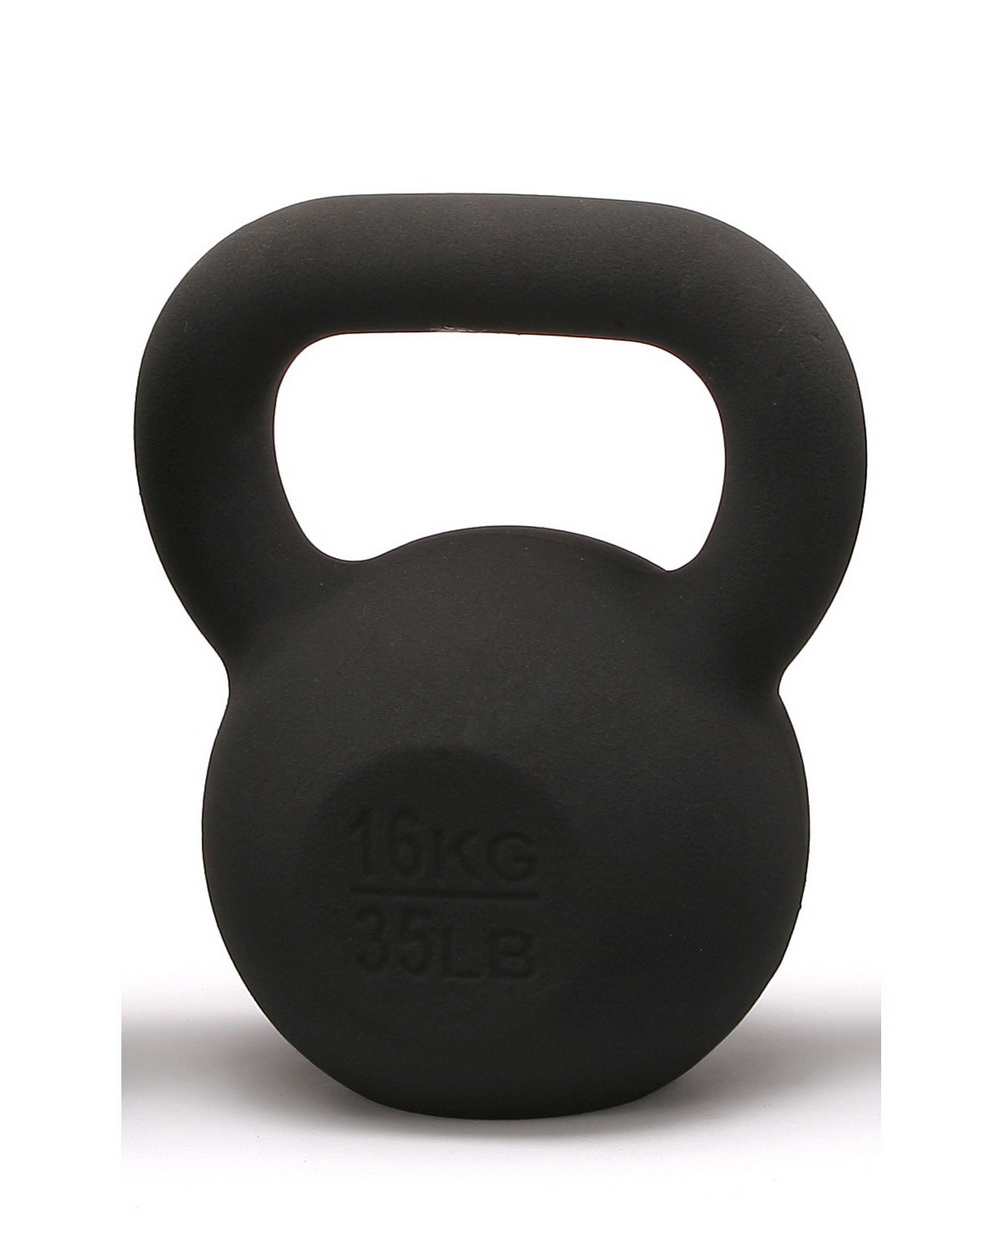 【Fitek 健身網】☆16KG壺鈴☆16公斤鑄鐵壺鈴 ☆Cast Iron Kettlebell☆健身重量訓練/有氧運動/肌耐力訓練㊣台灣製